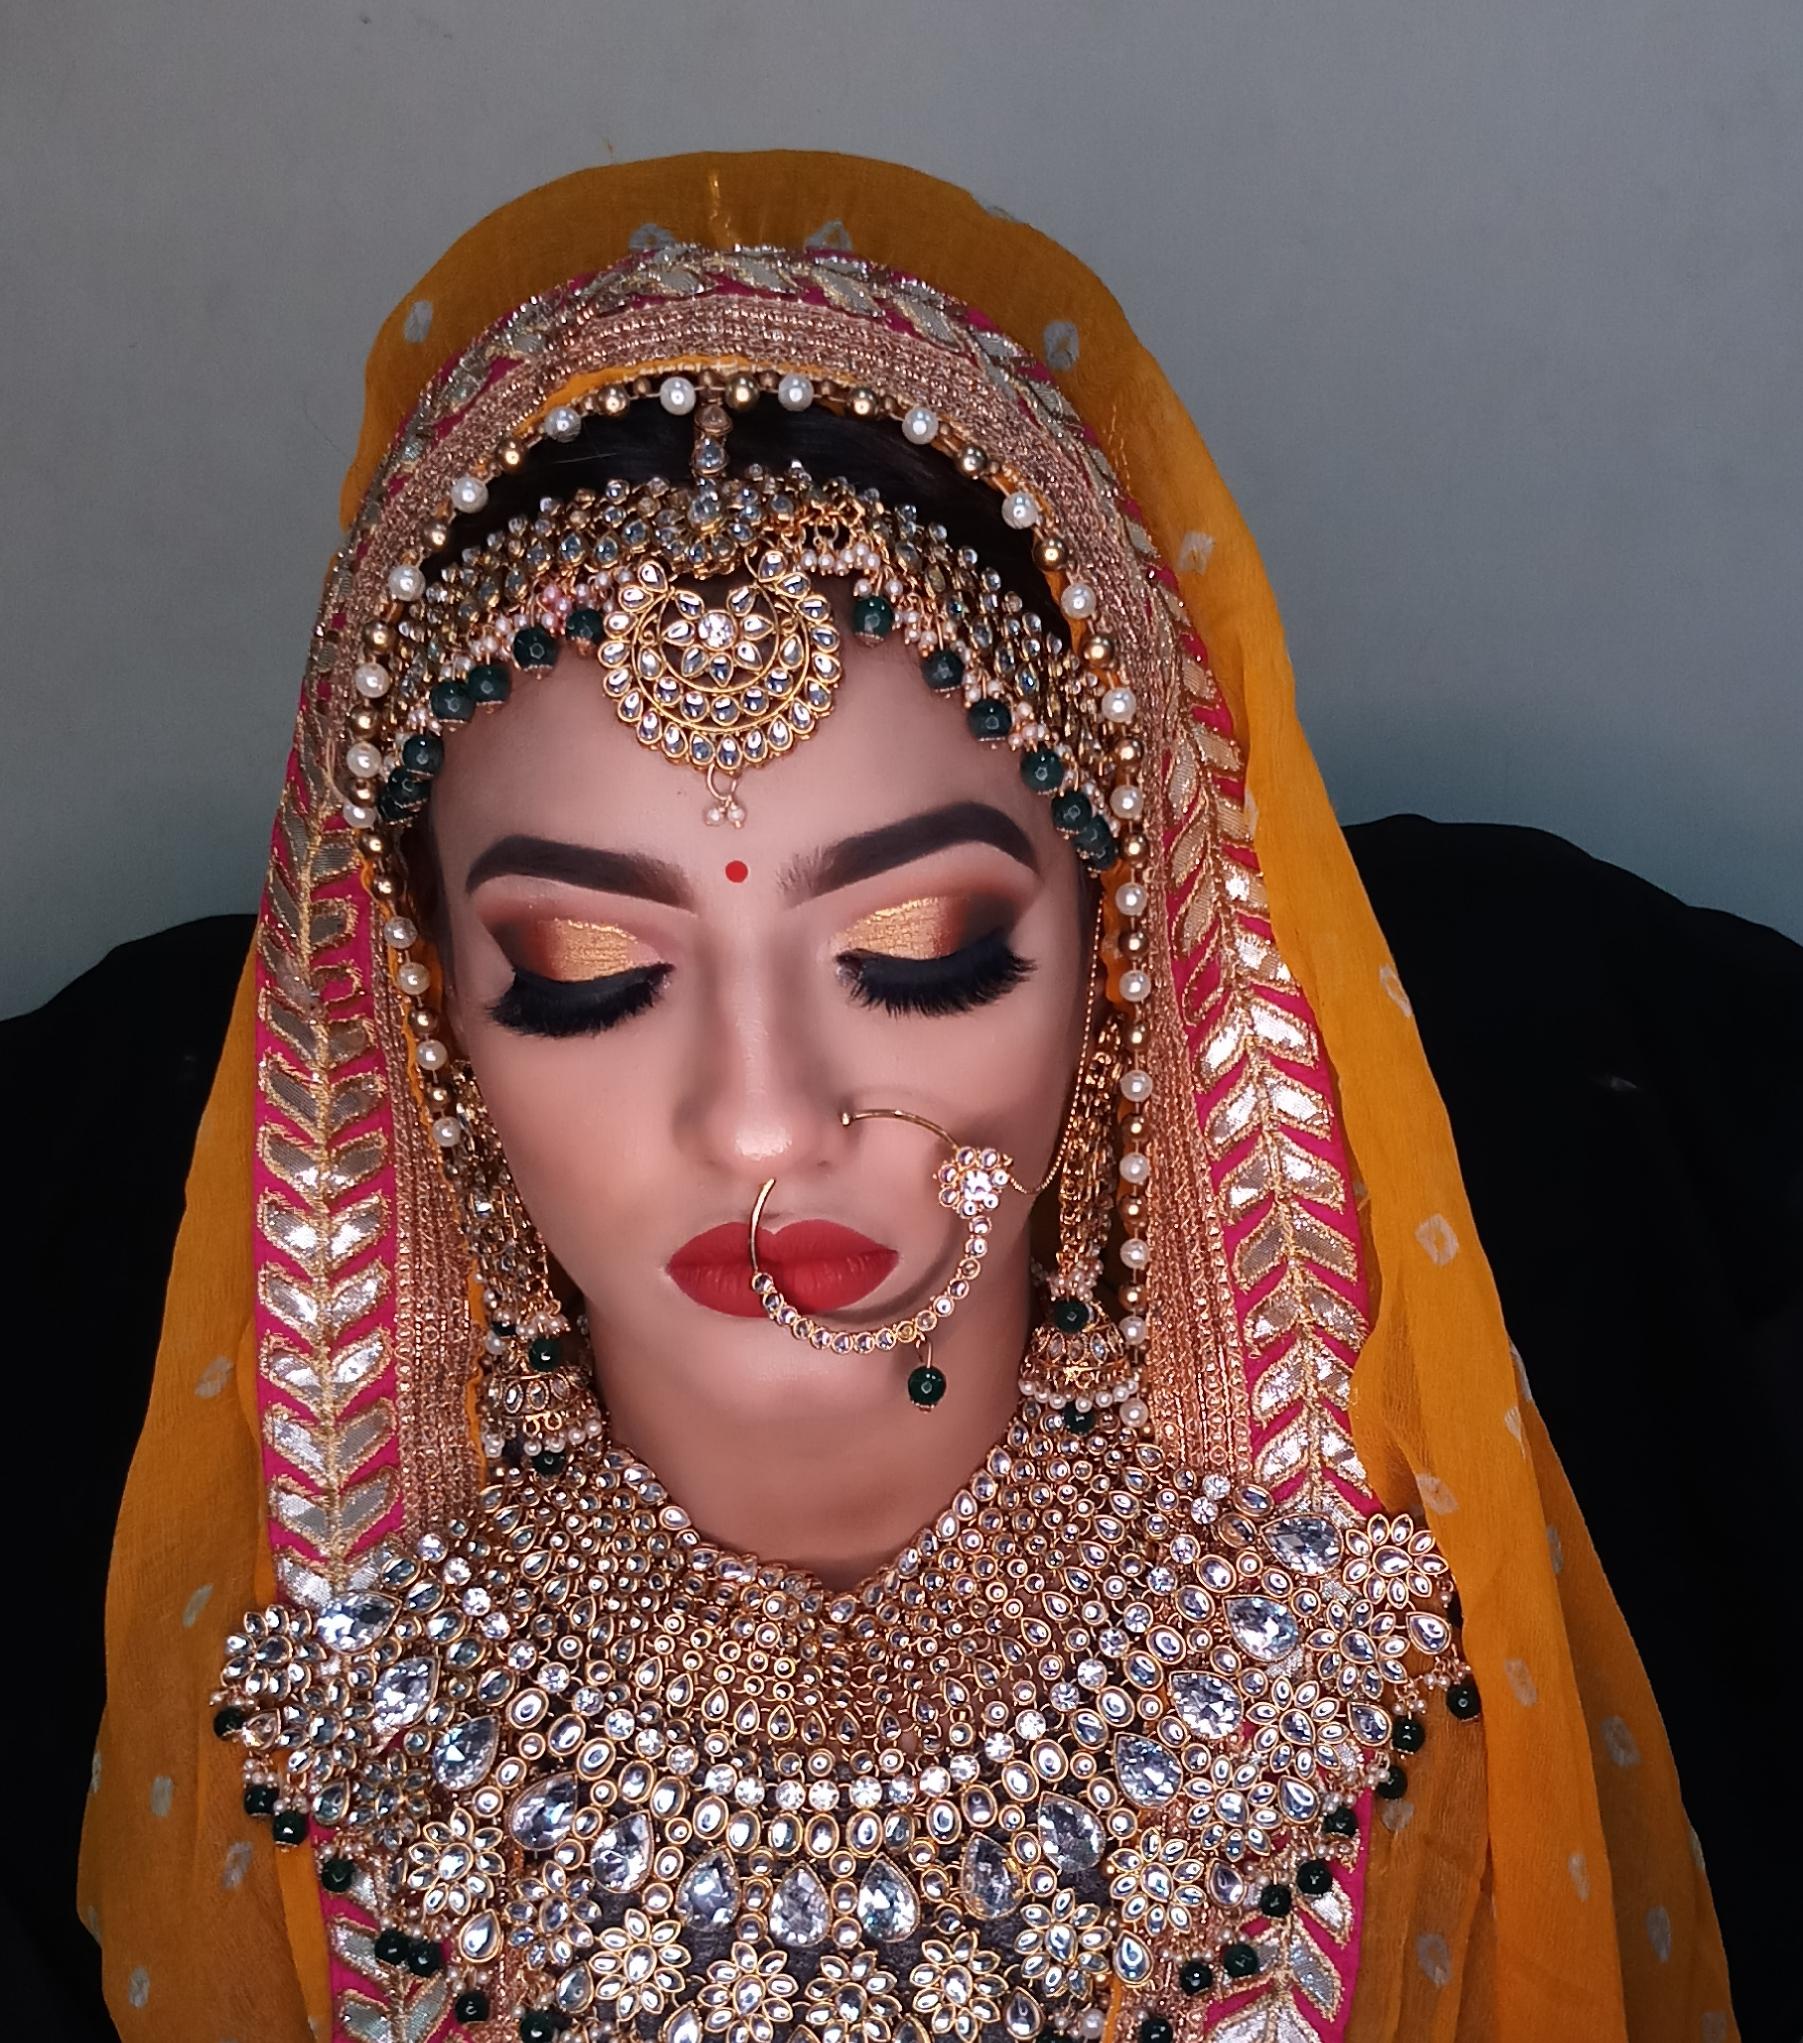 instaura-makeovers-by-puneeta-makeup-artist-delhi-ncr